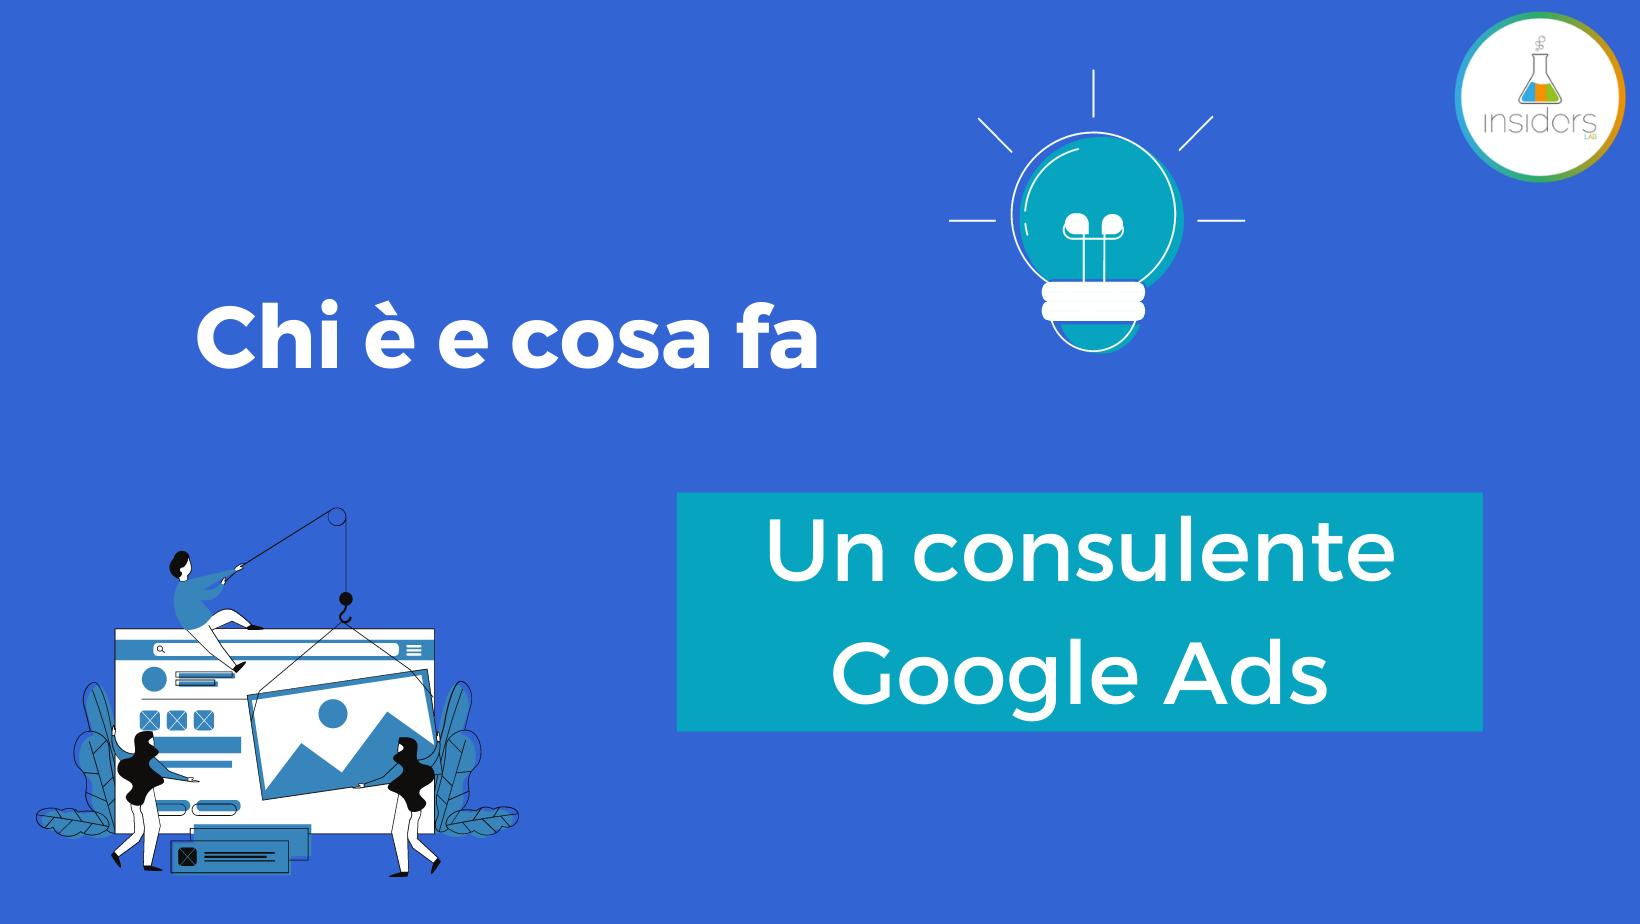 Consulente Google Ads